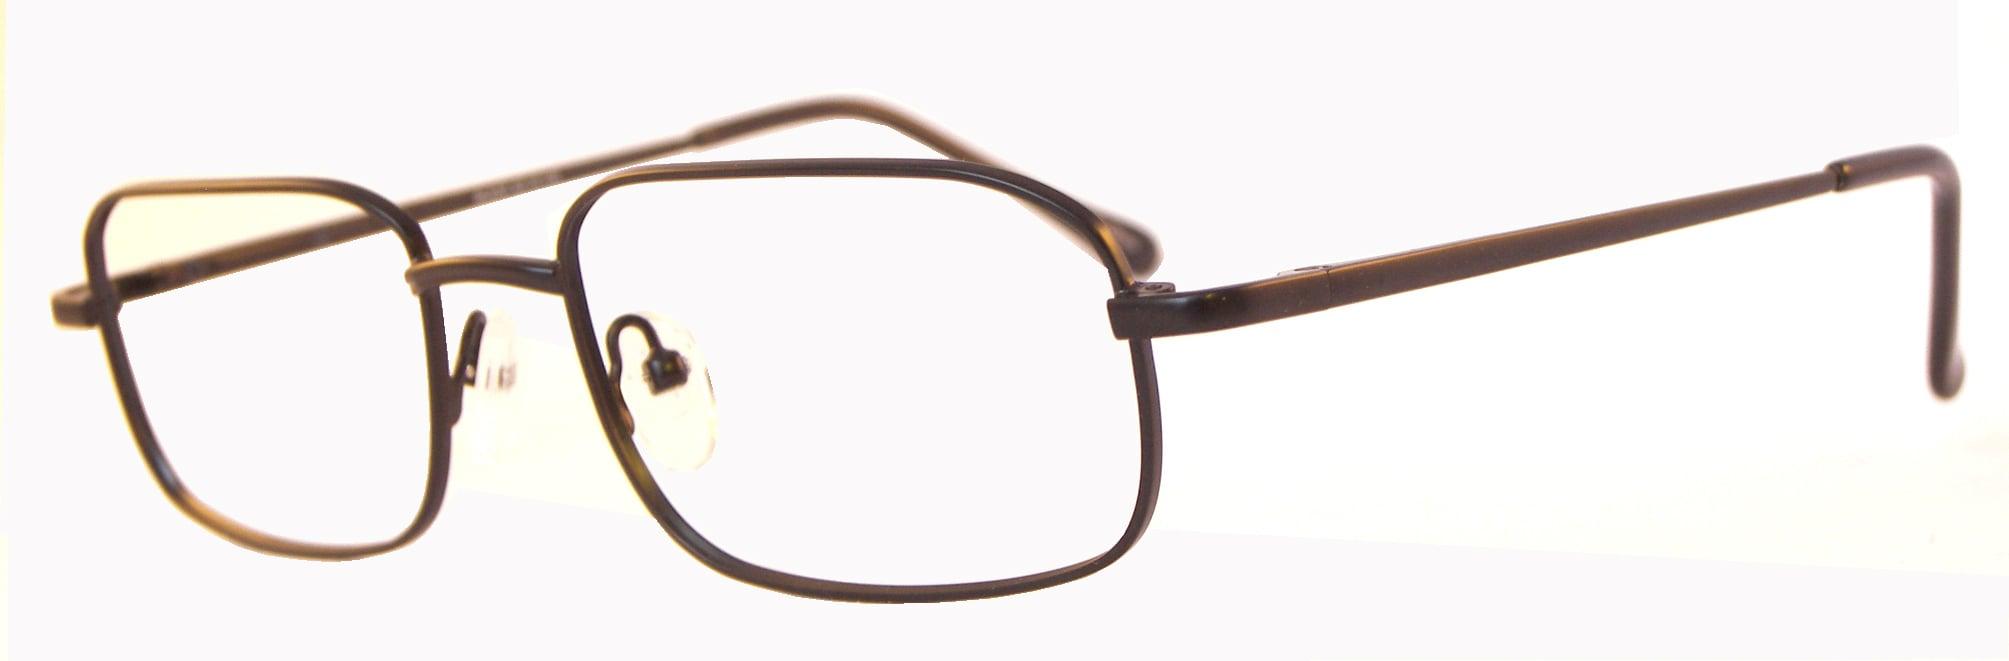 VP-142:  52-18-145 Available in Black, Brown or Gunmetal